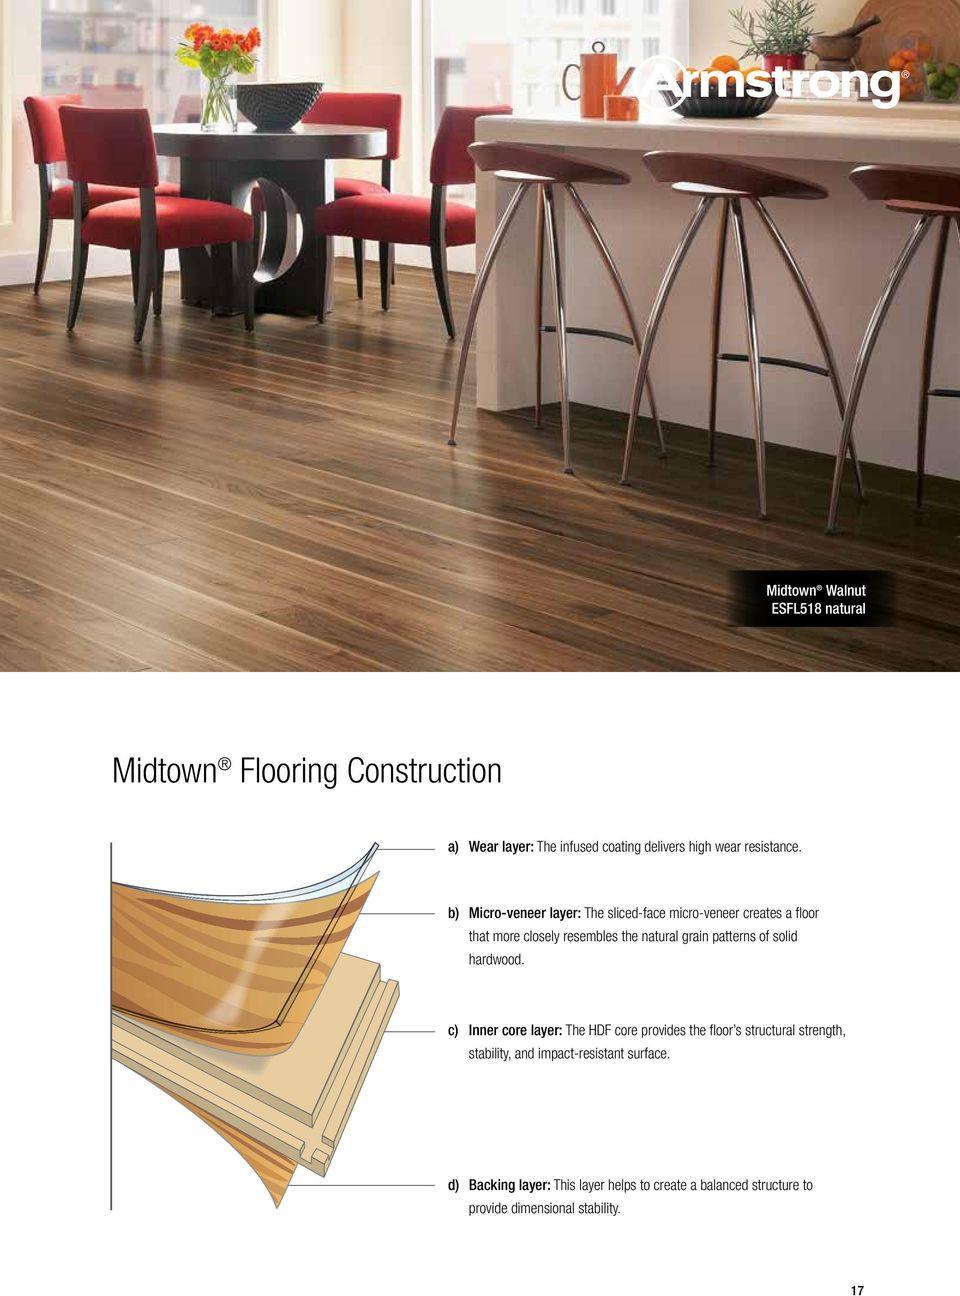 graphite maple hardwood flooring of performance plus midtown pdf with b micro veneer layer the sliced face micro veneer creates a 18 midtown hardwood custom flooring